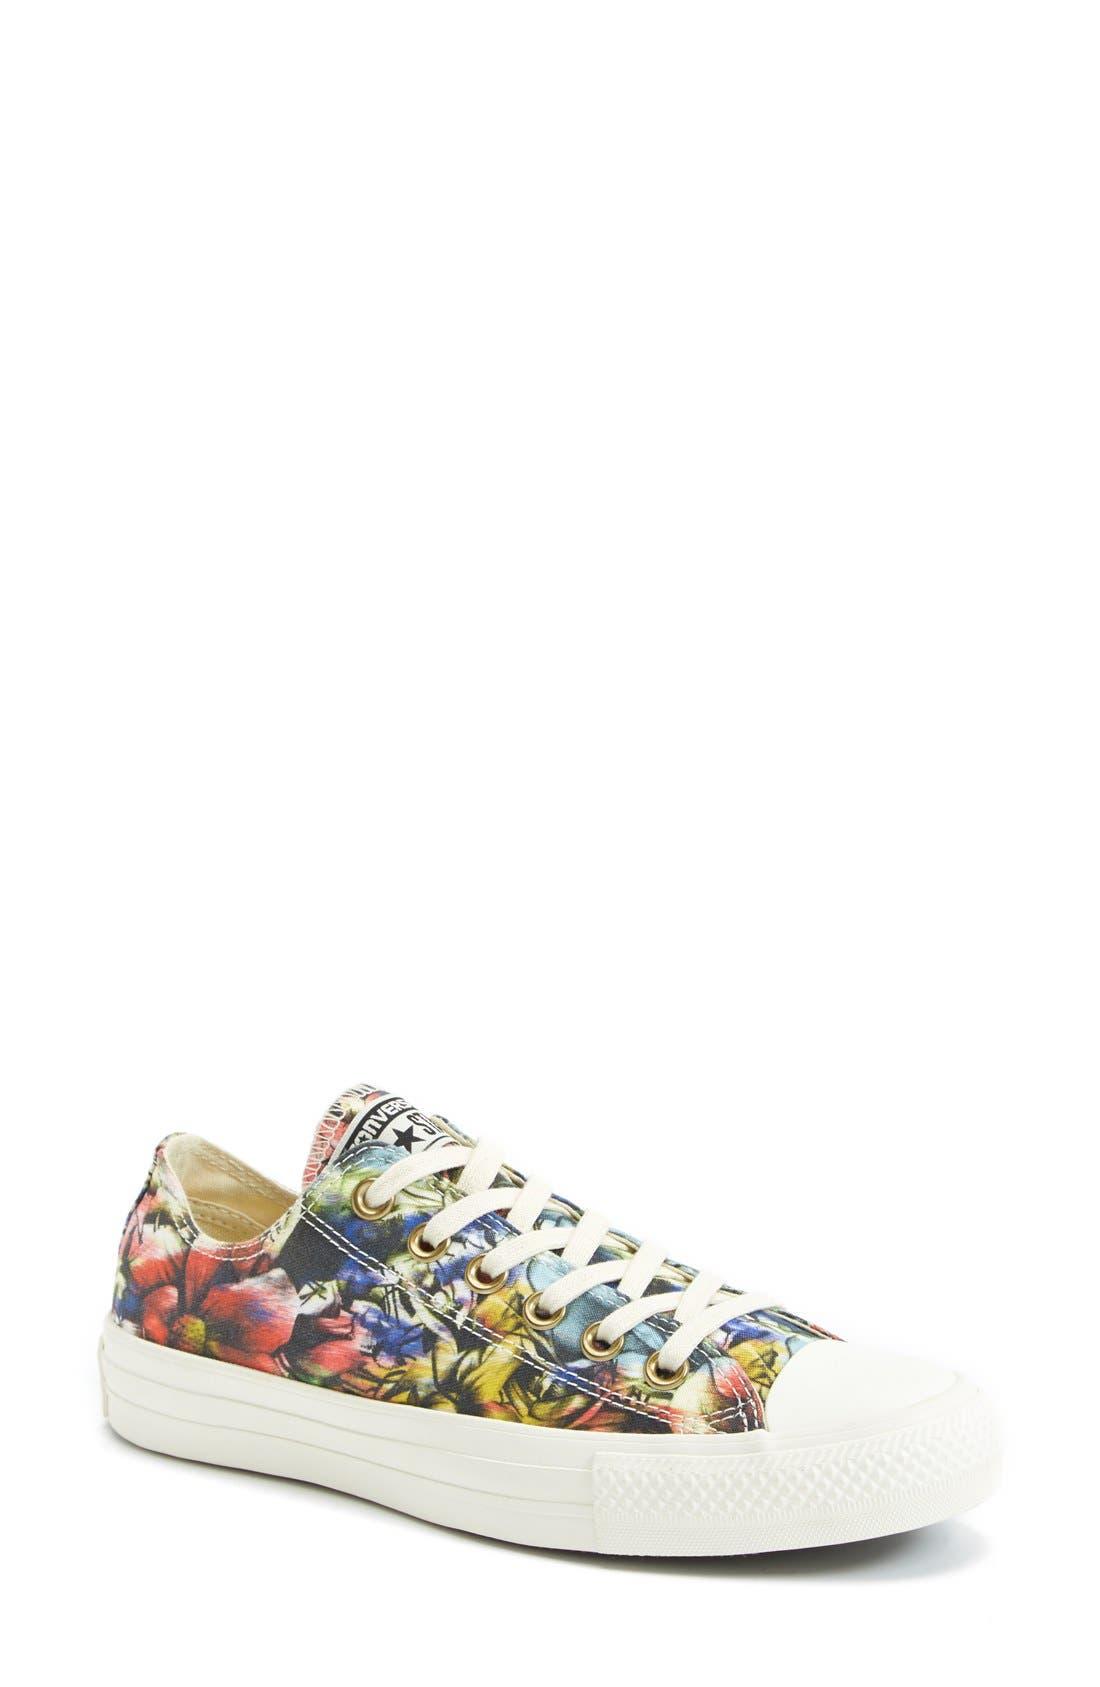 Alternate Image 1 Selected - Converse Chuck Taylor® Floral Print Sneaker (Women)